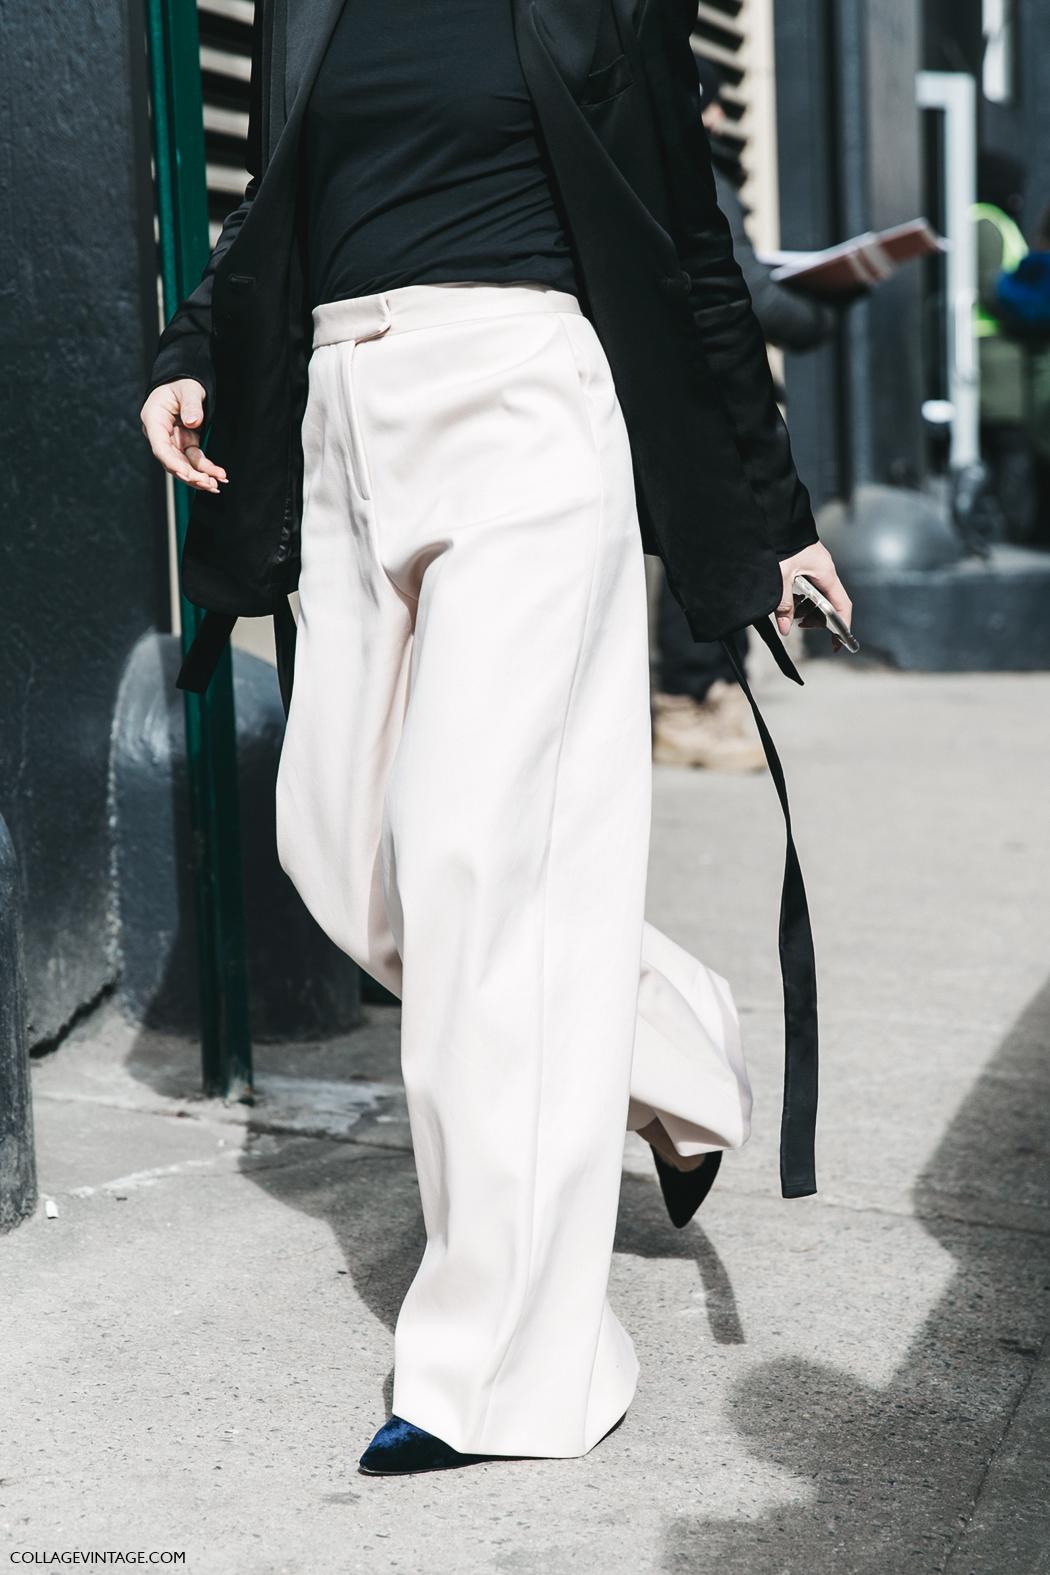 NYFW-New_York_Fashion_Week-Fall_Winter-17-Street_Style-Black_And_White-